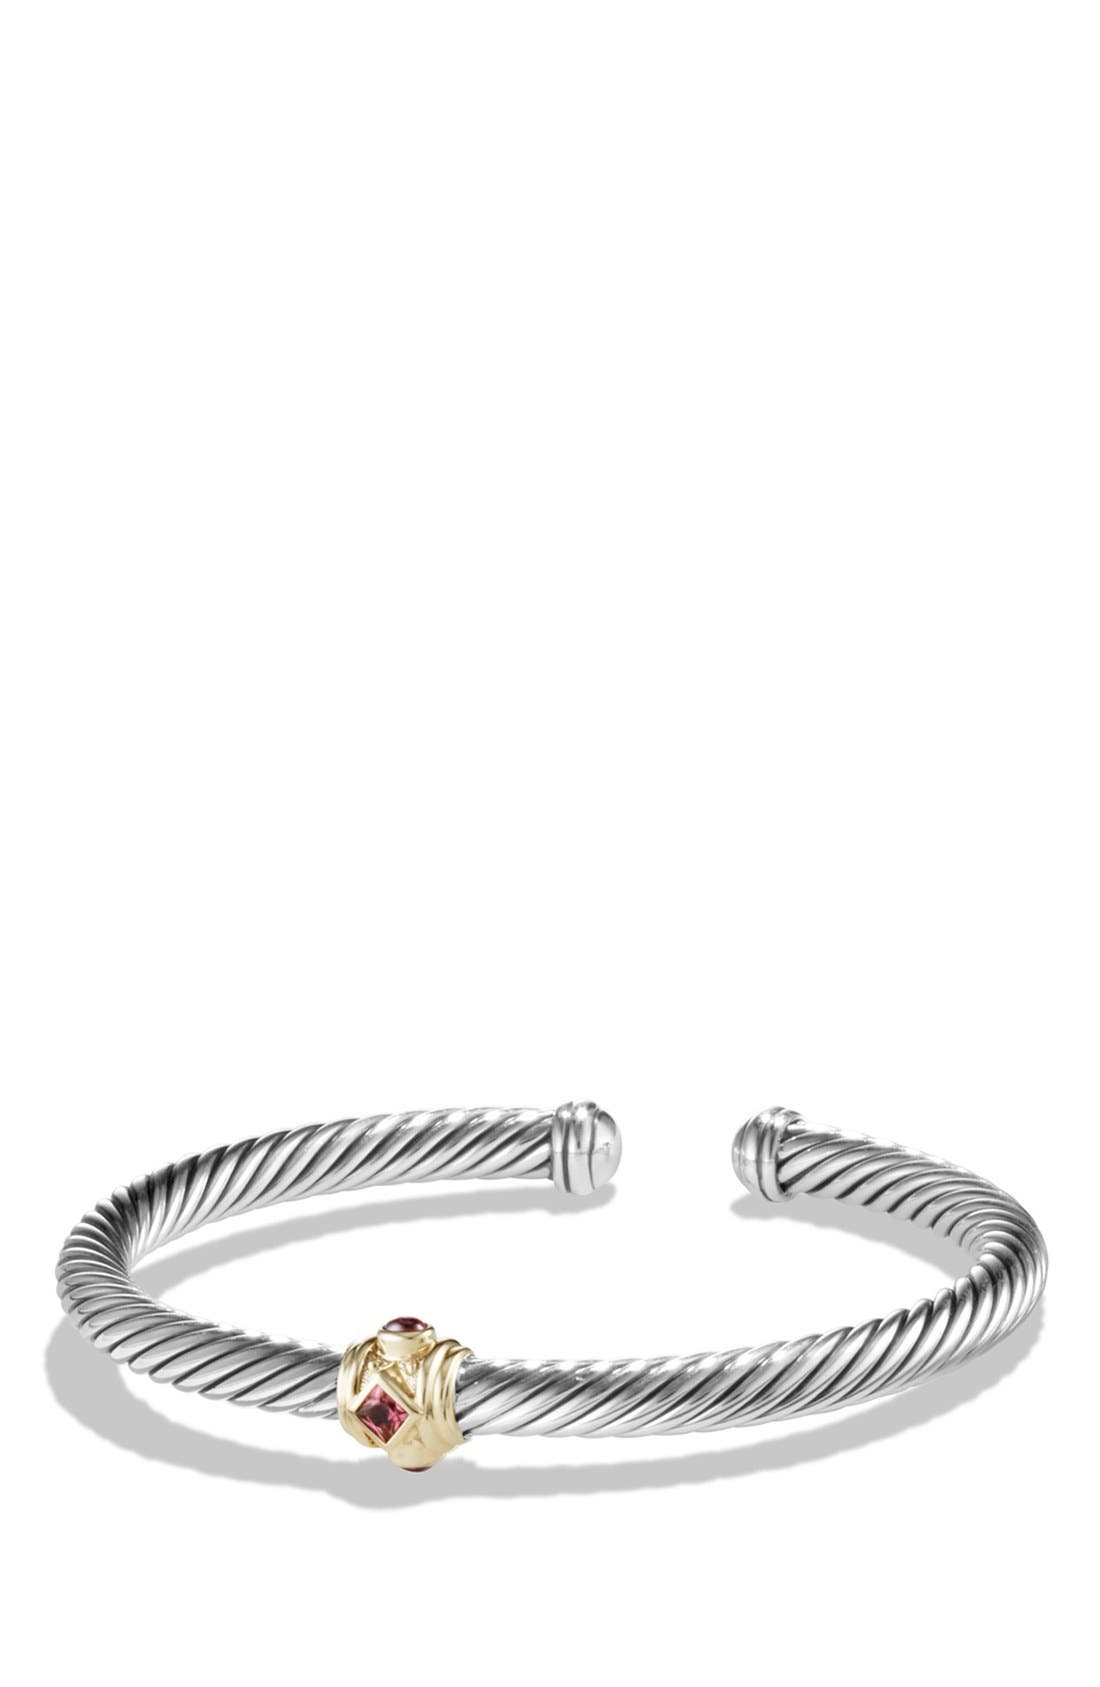 Renaissance Bracelet with Semiprecious Stones & 14K Gold, 5mm,                             Main thumbnail 1, color,                             PINK TOURMALINE